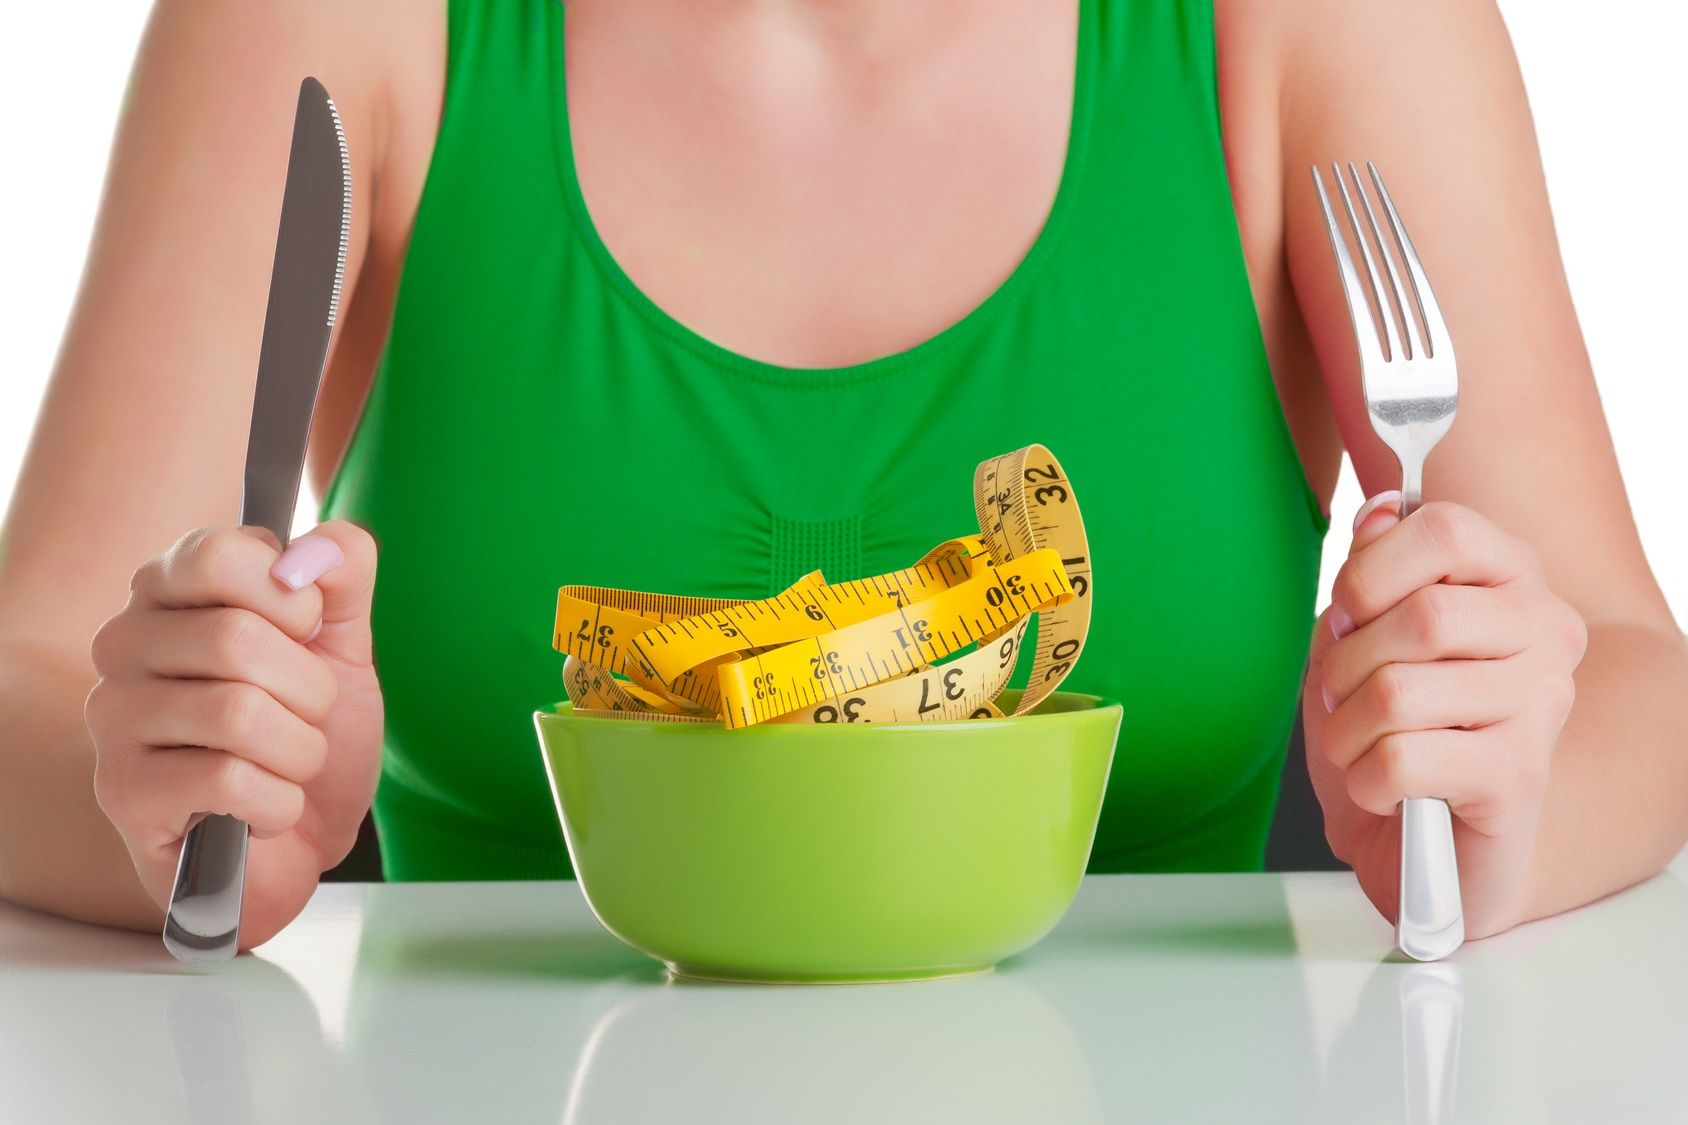 5 excusas típicas para no bajar de peso